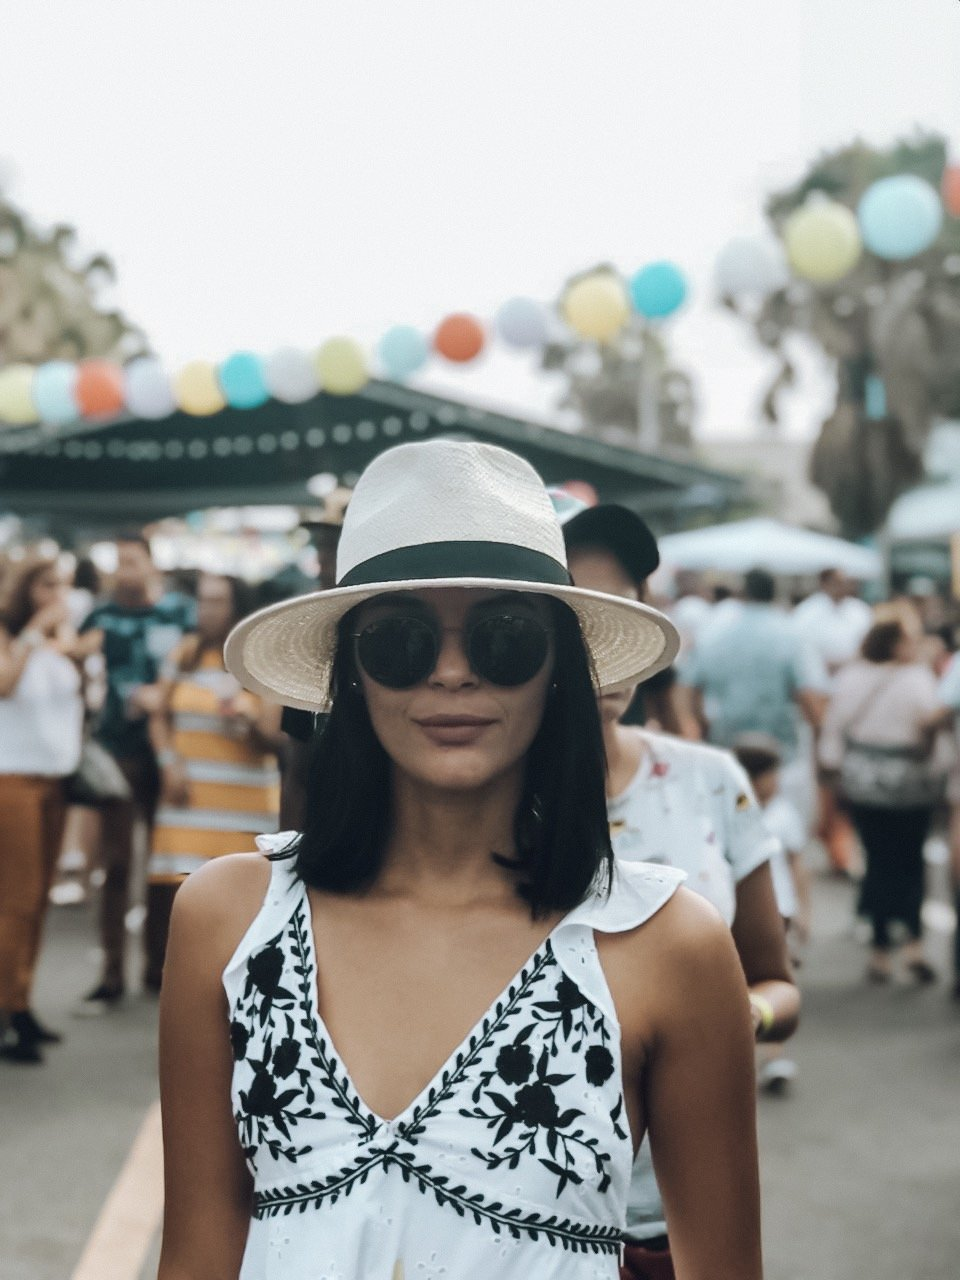 Bocao Food Fest: A Gastronomic Festival